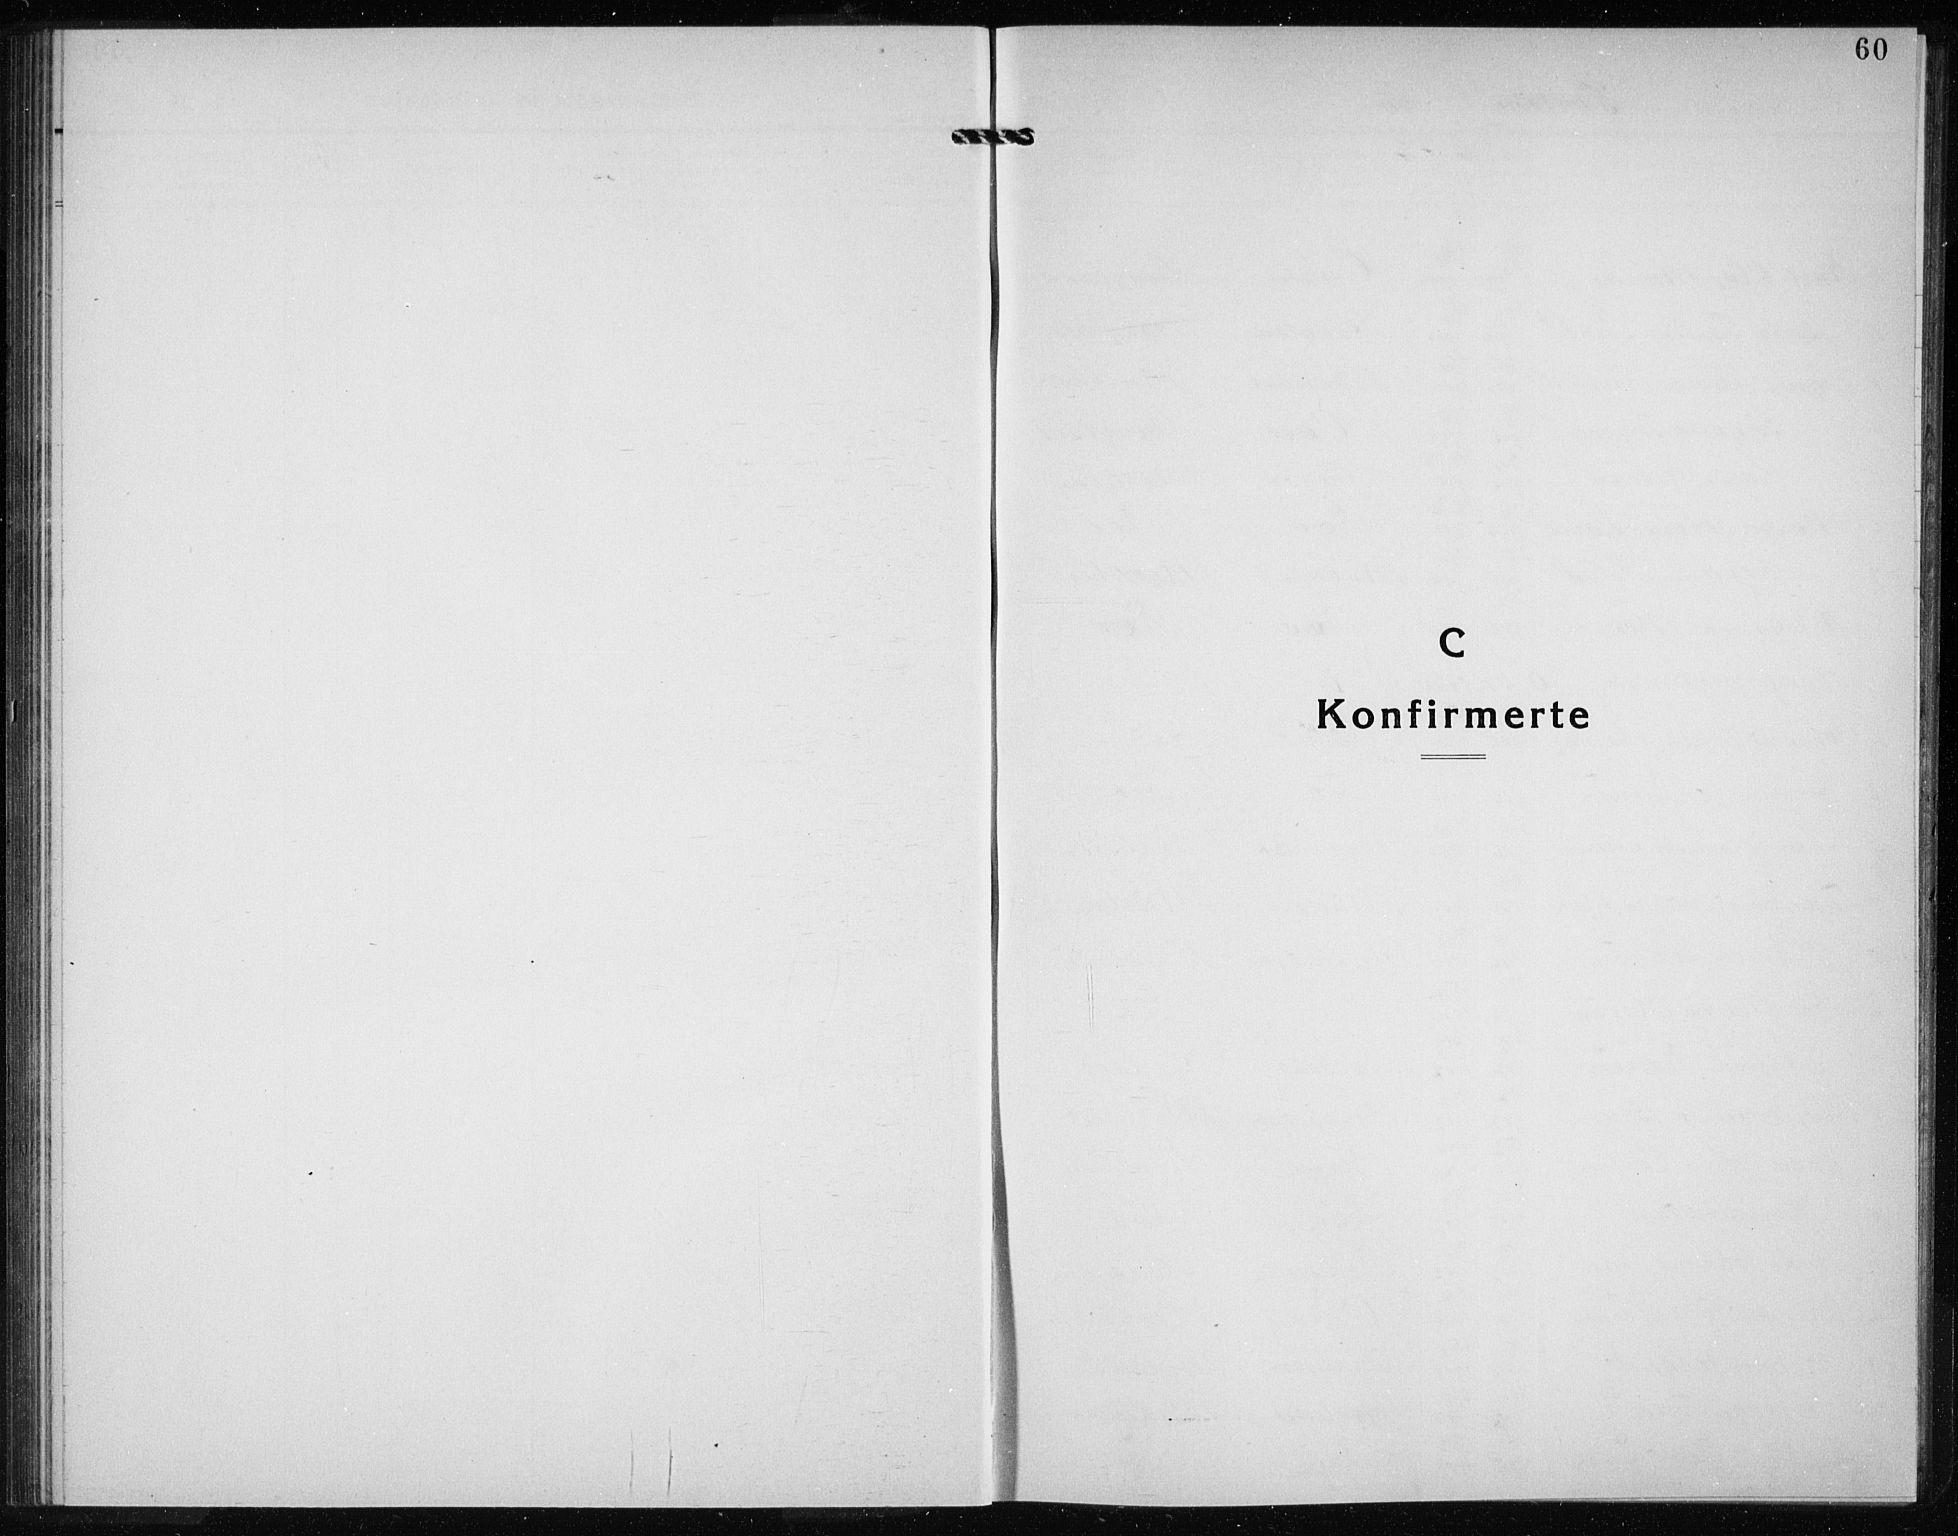 SAB, Kvinnherad Sokneprestembete, H/Haa: Ministerialbok nr. G  1, 1920-1927, s. 60